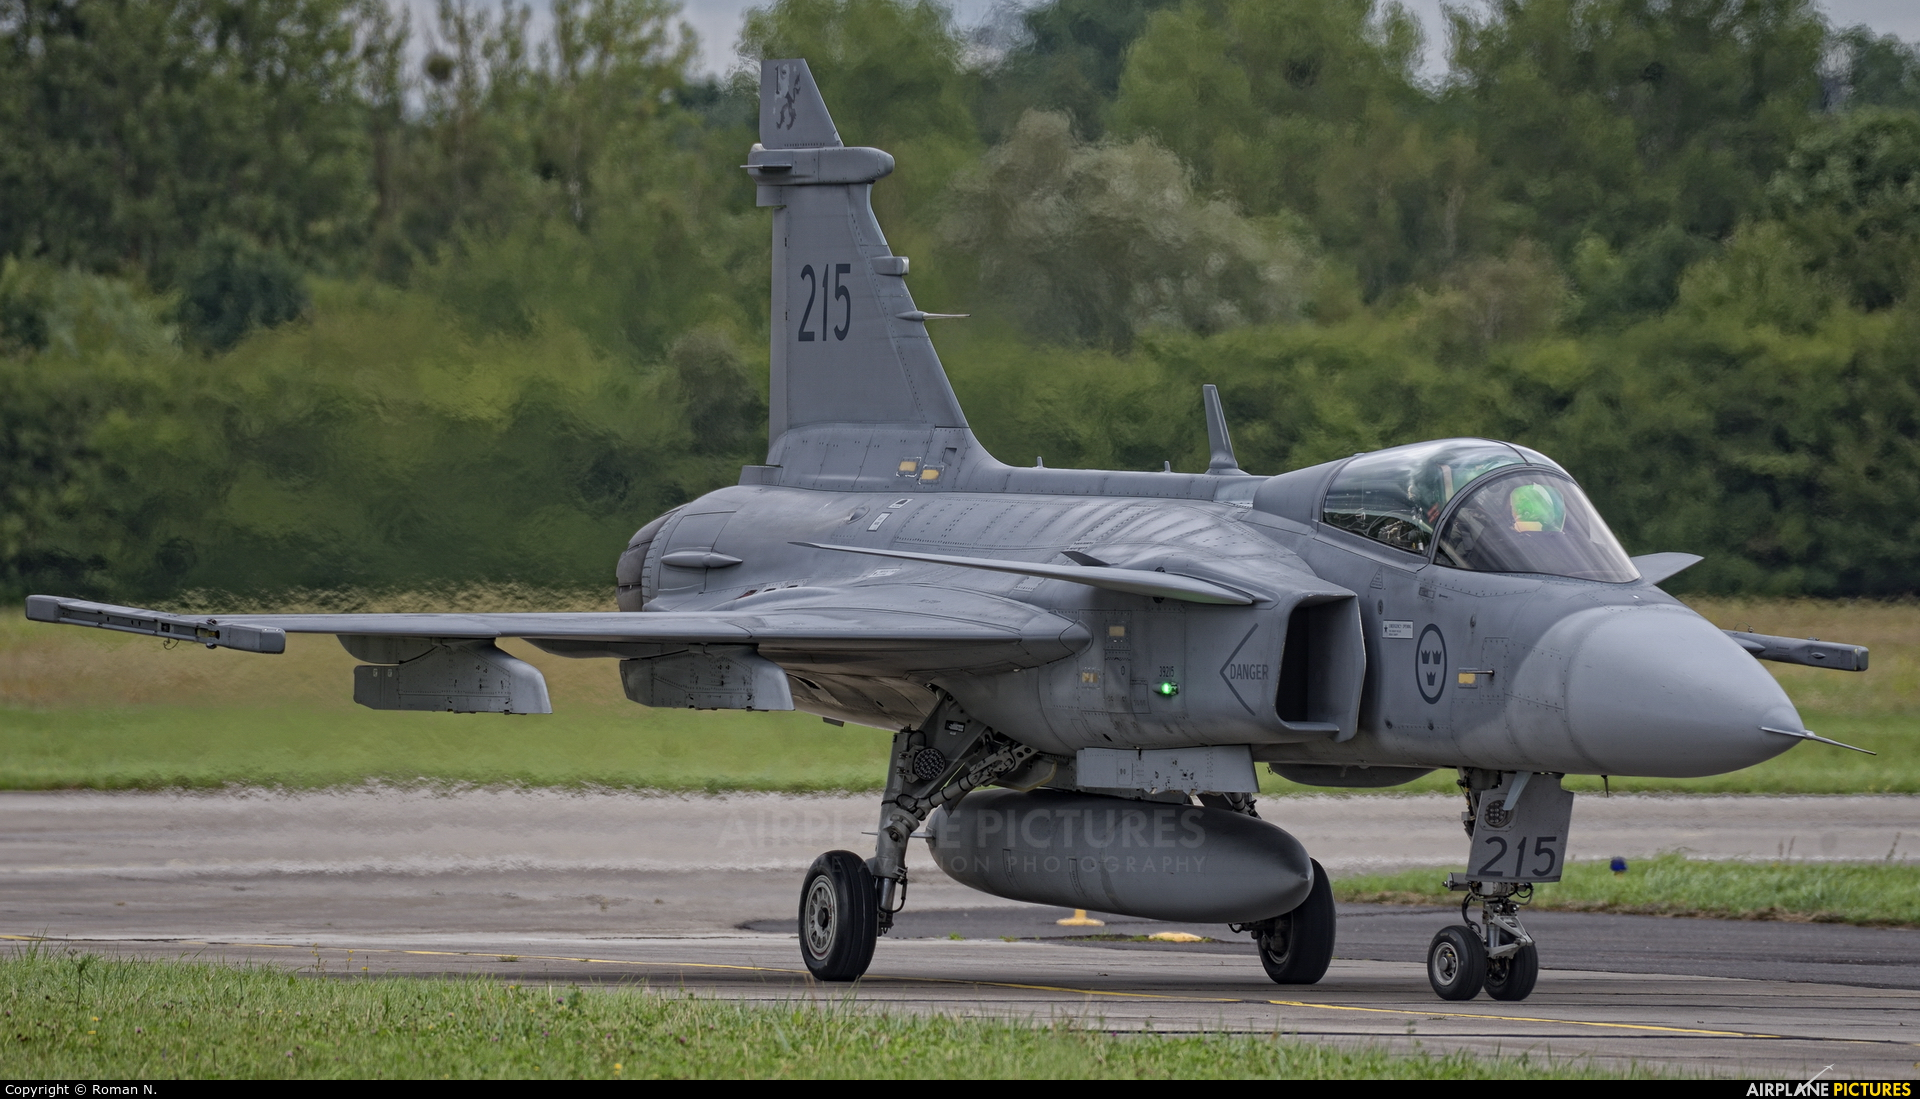 Sweden - Air Force 39215 aircraft at Gdynia- Babie Doły (Oksywie)